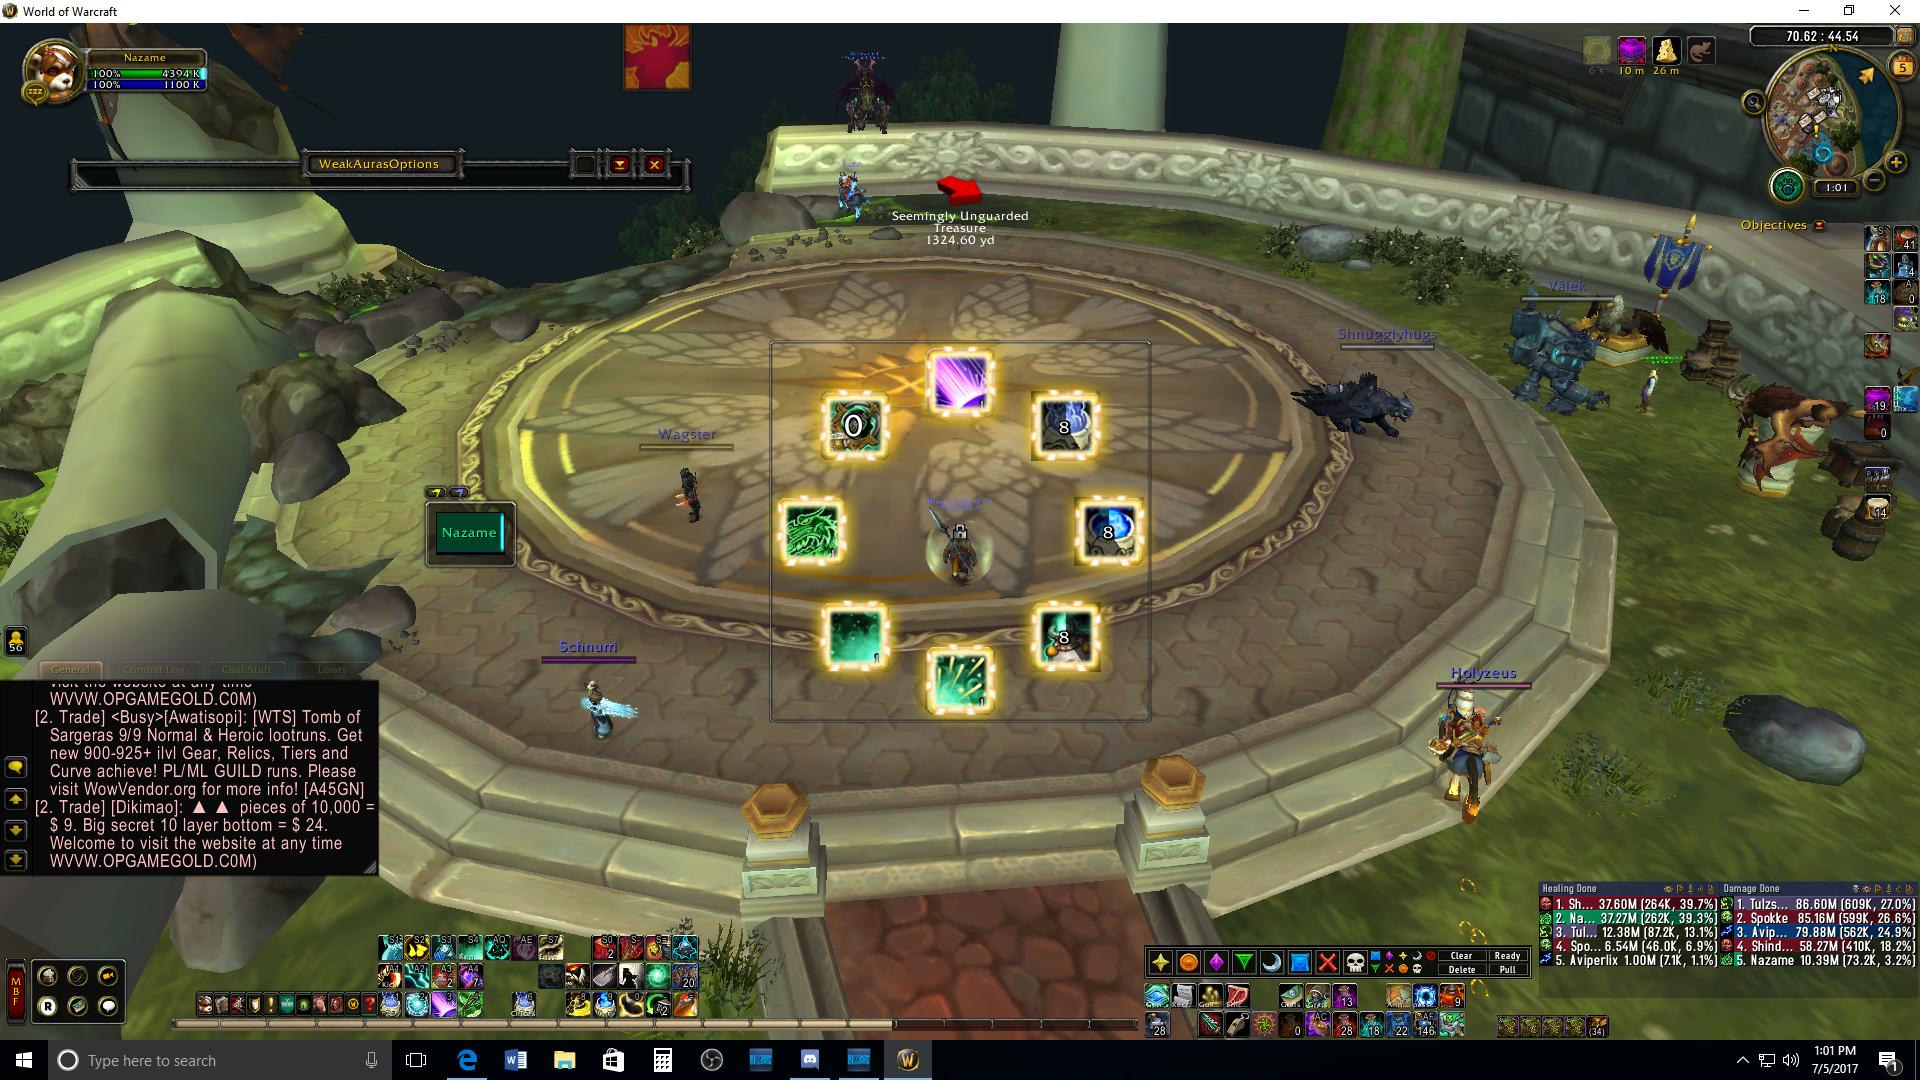 MW icon ability proc